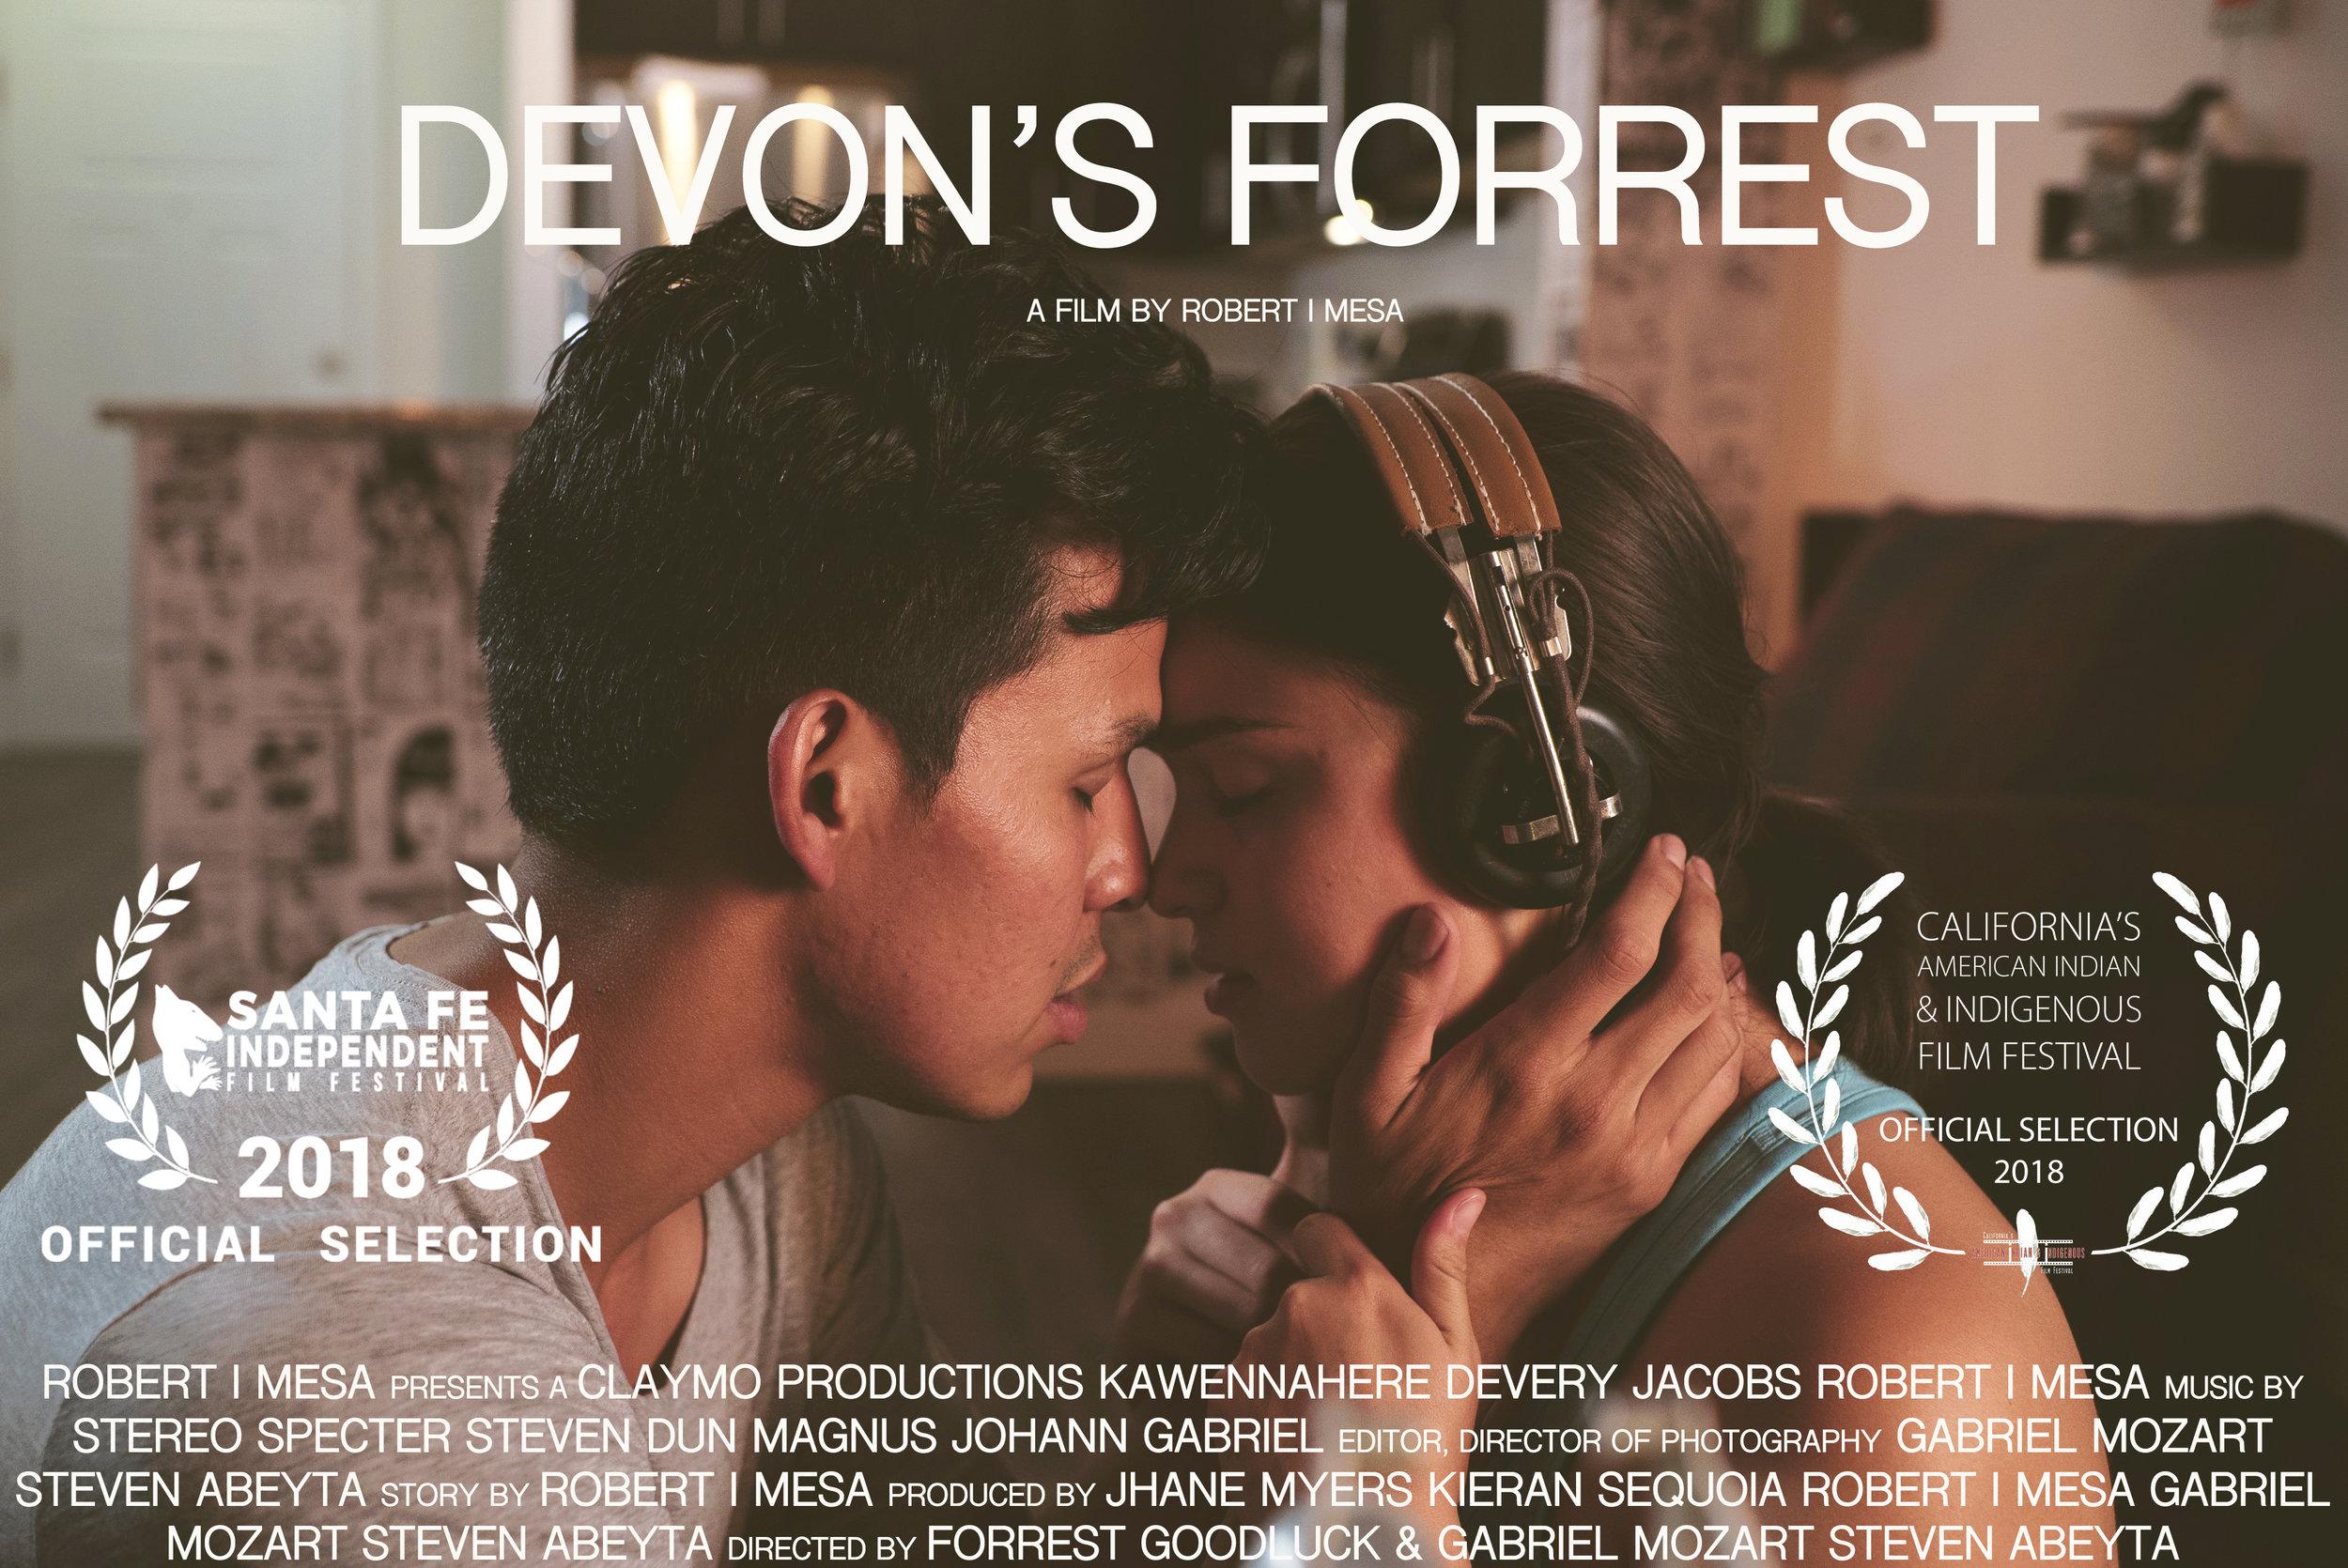 DEVON'S_FORREST POSTER_2018_CAIFF_SELECTION_02.jpg